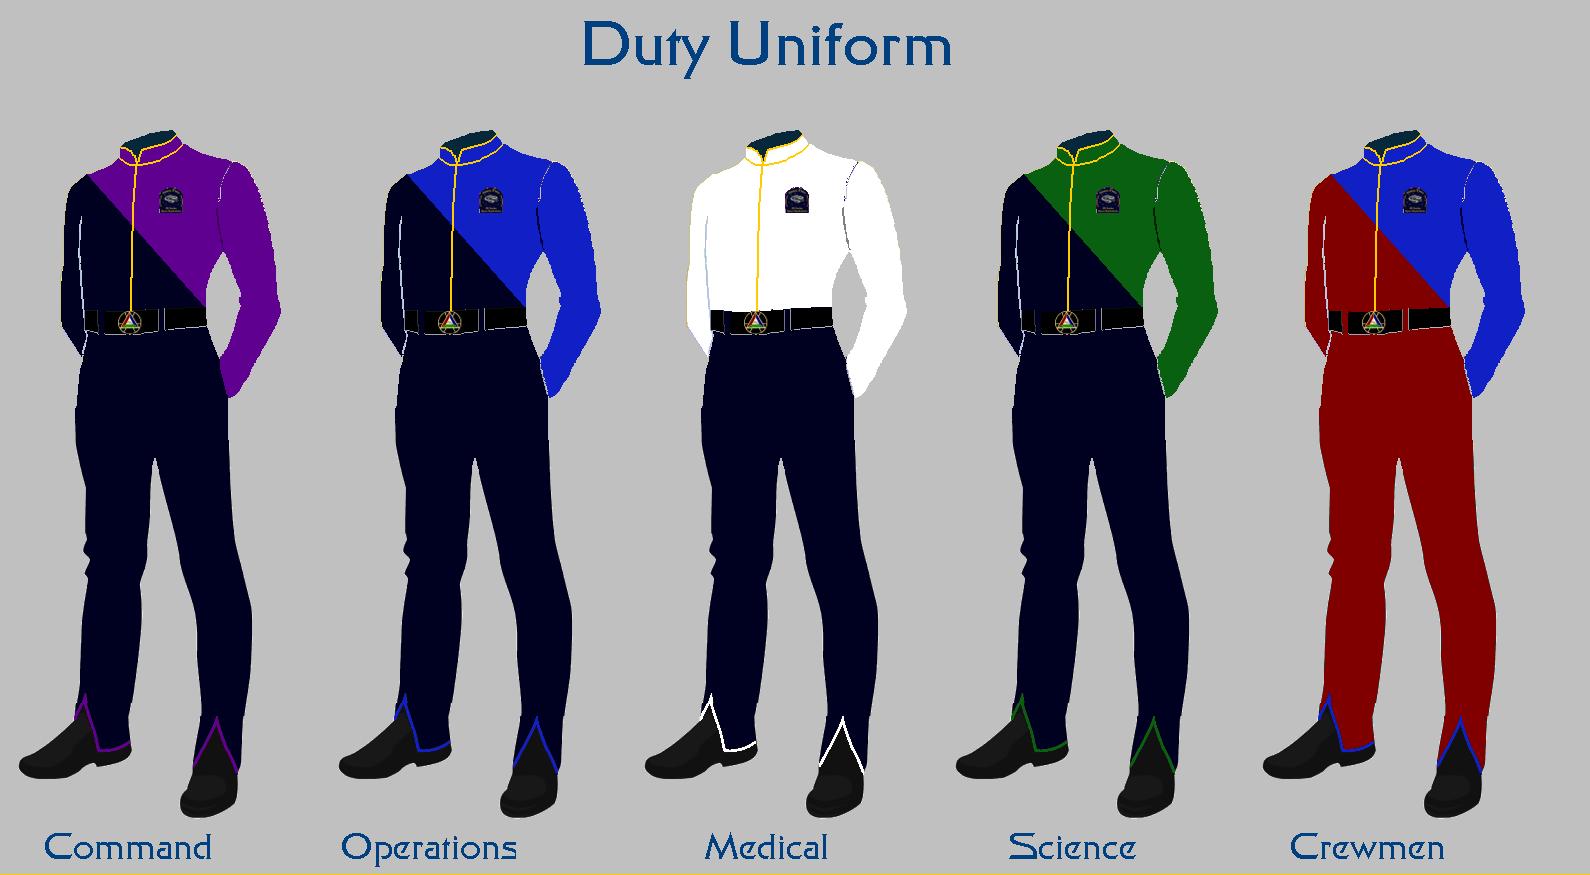 Duty Uniforms